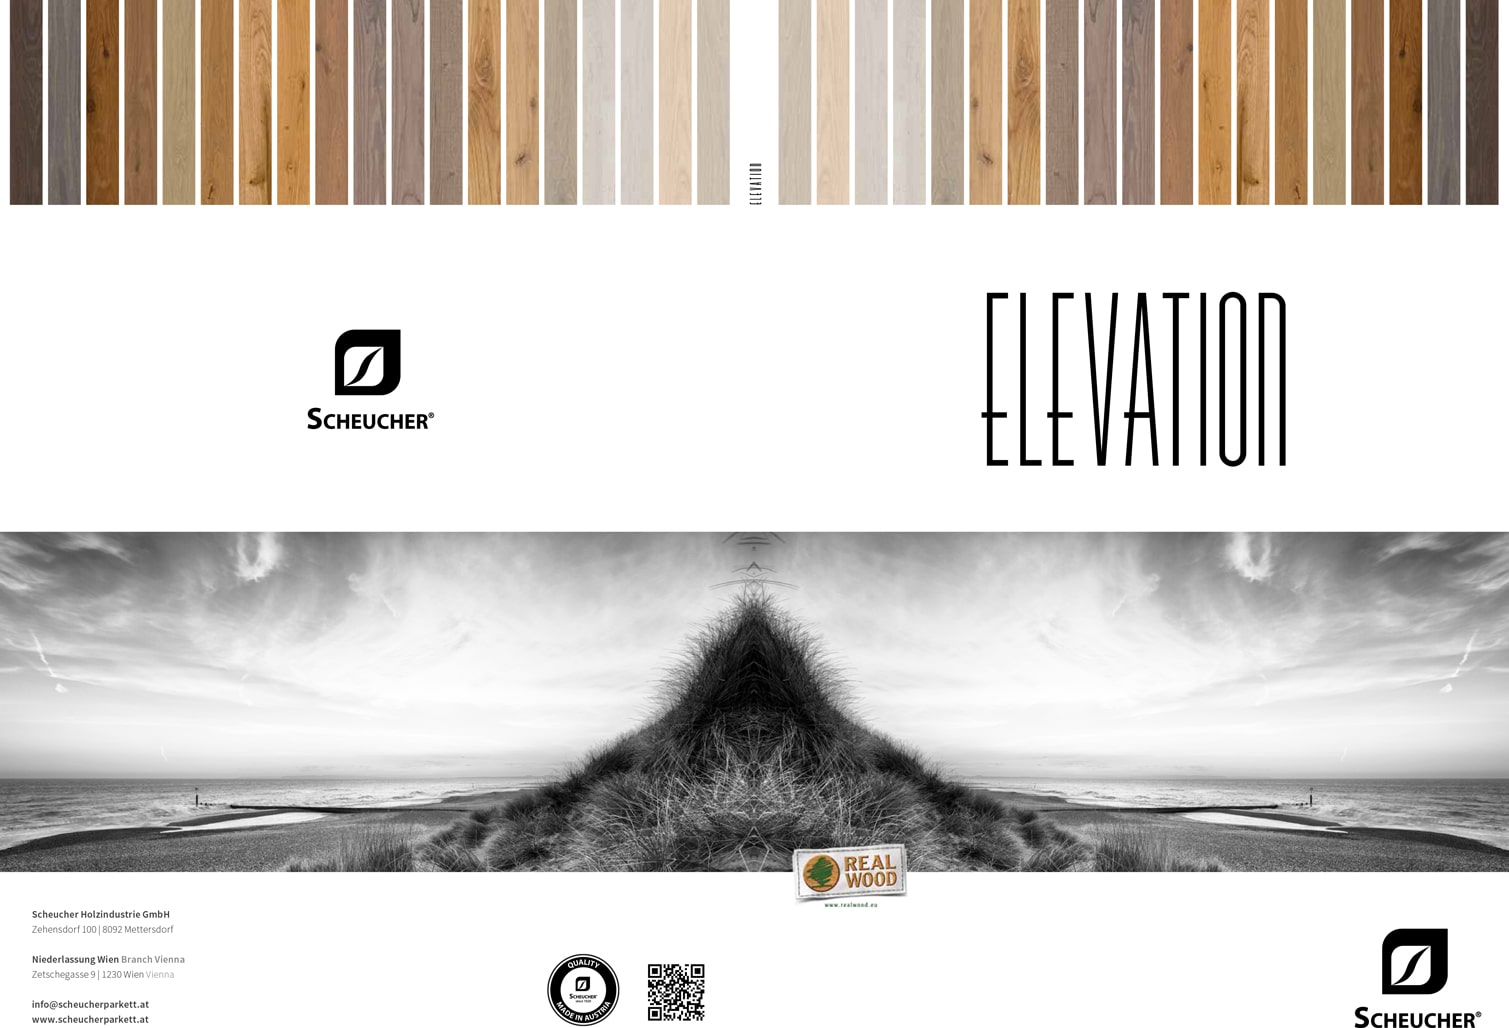 katalog elevation 2020 parketarstvo florjancic